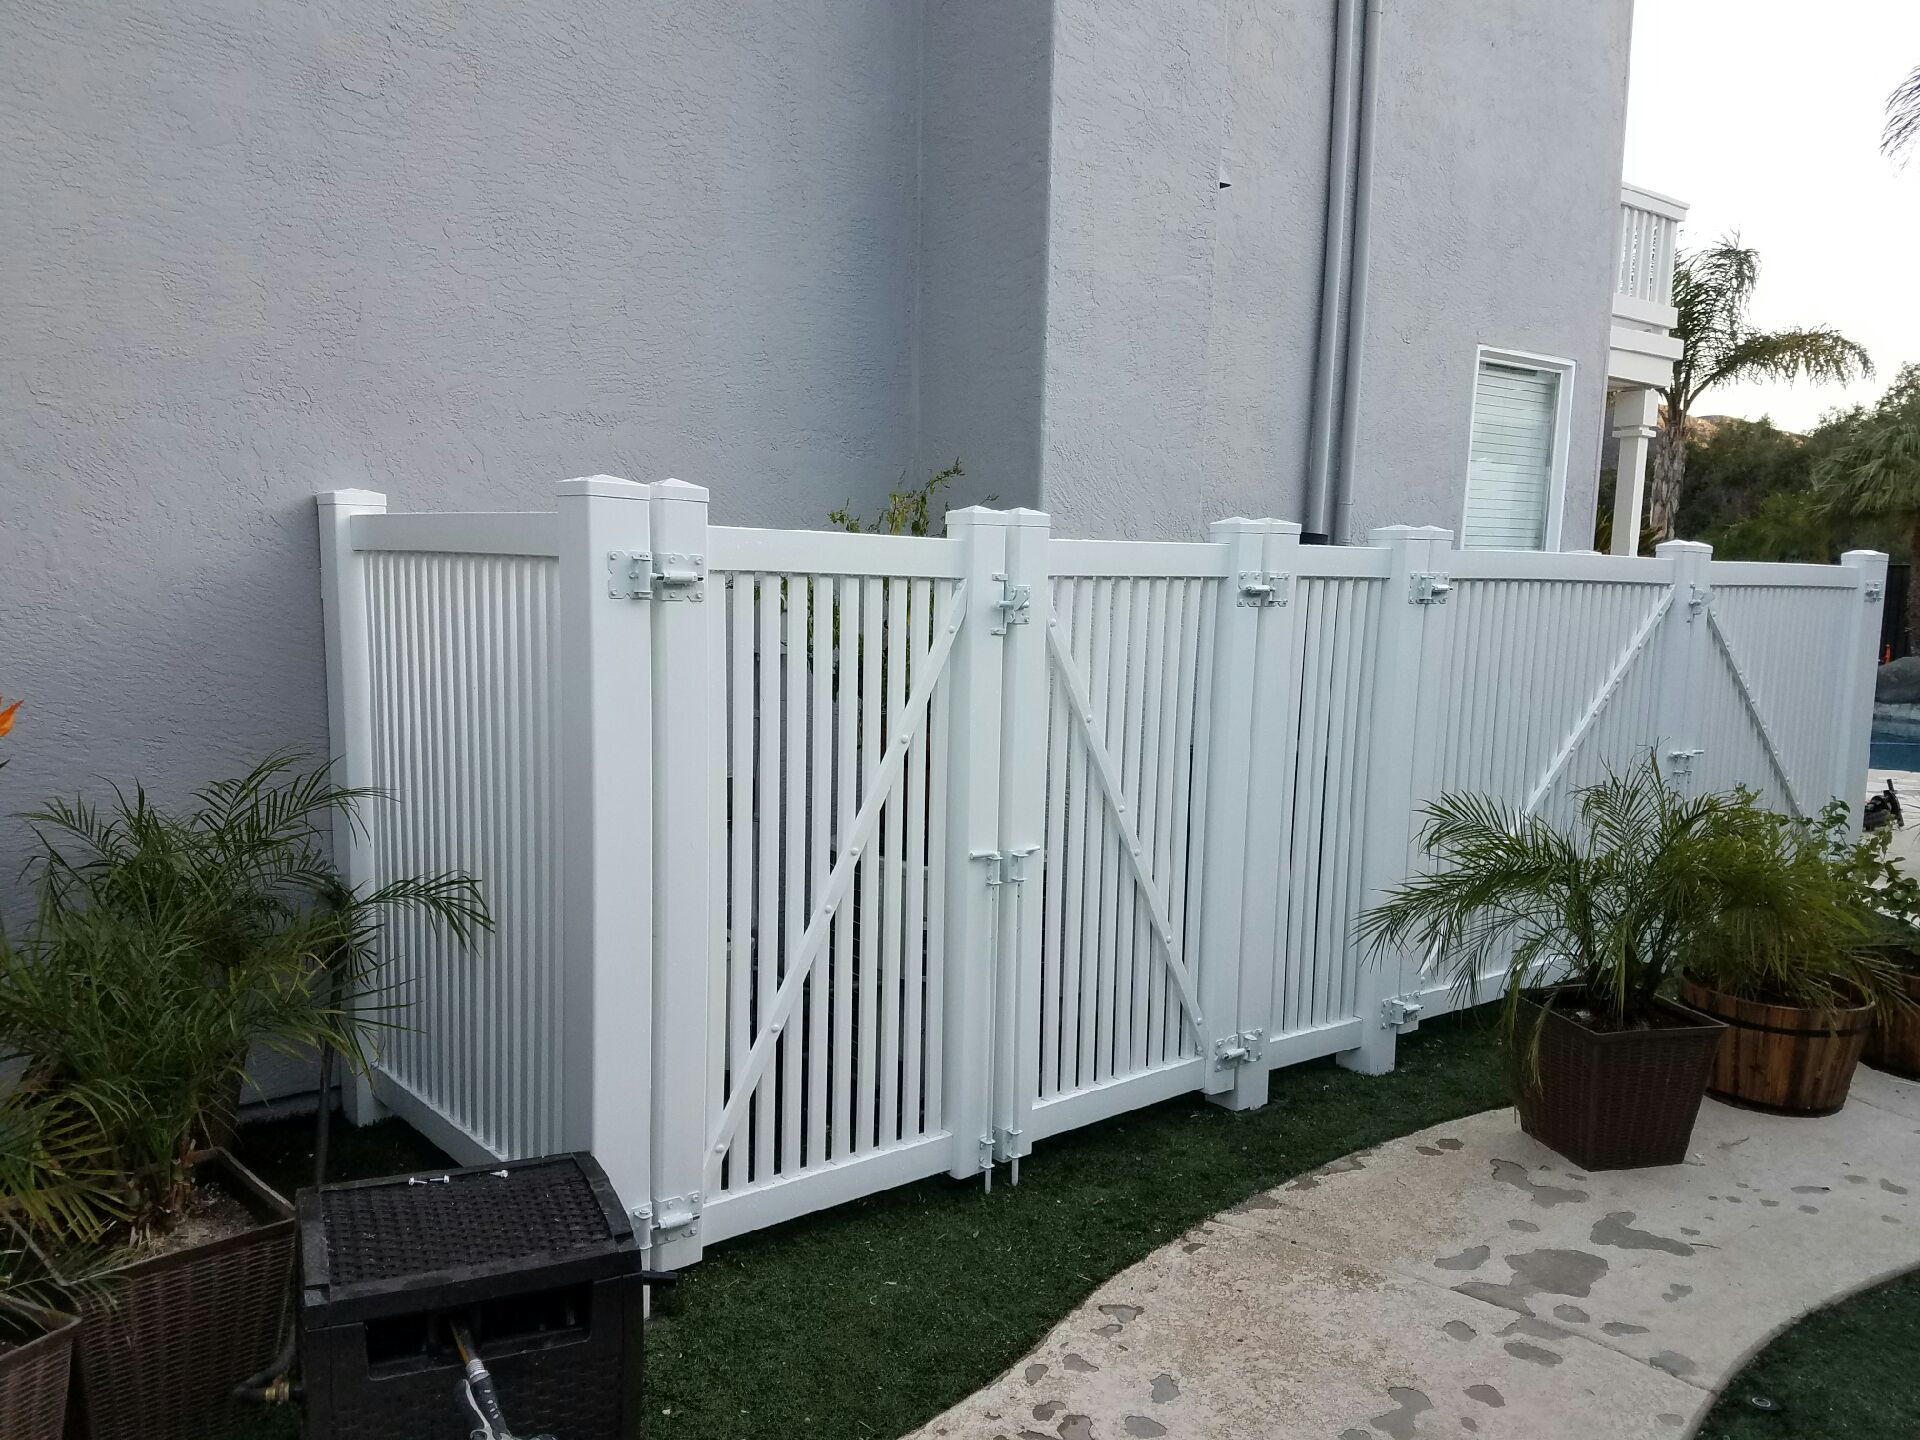 3T Fence image 34